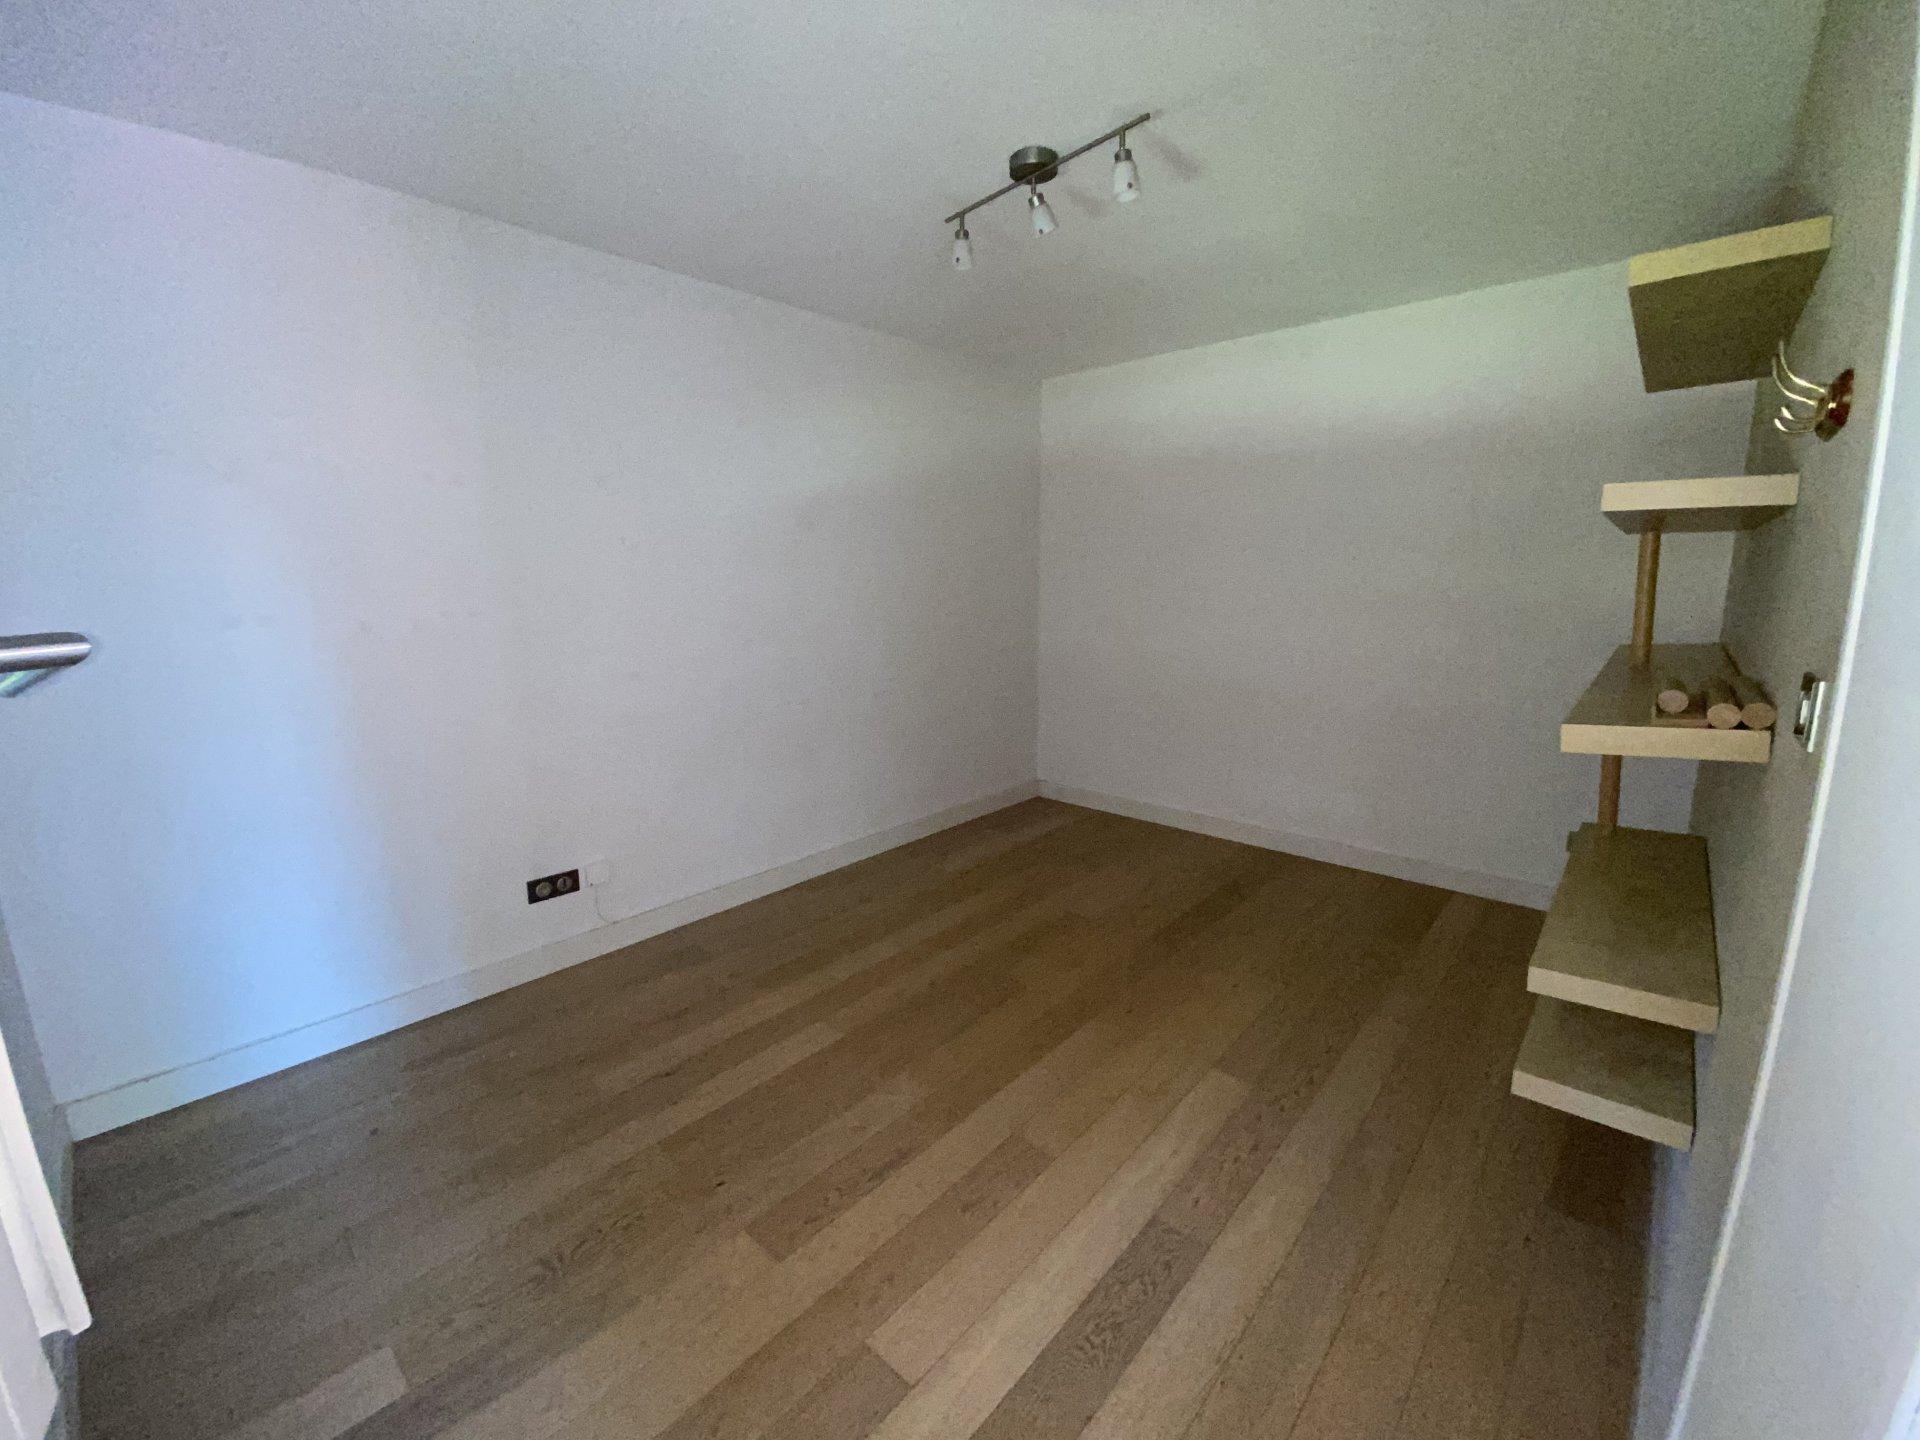 Appartement detype 4, terrasse , cave et parking